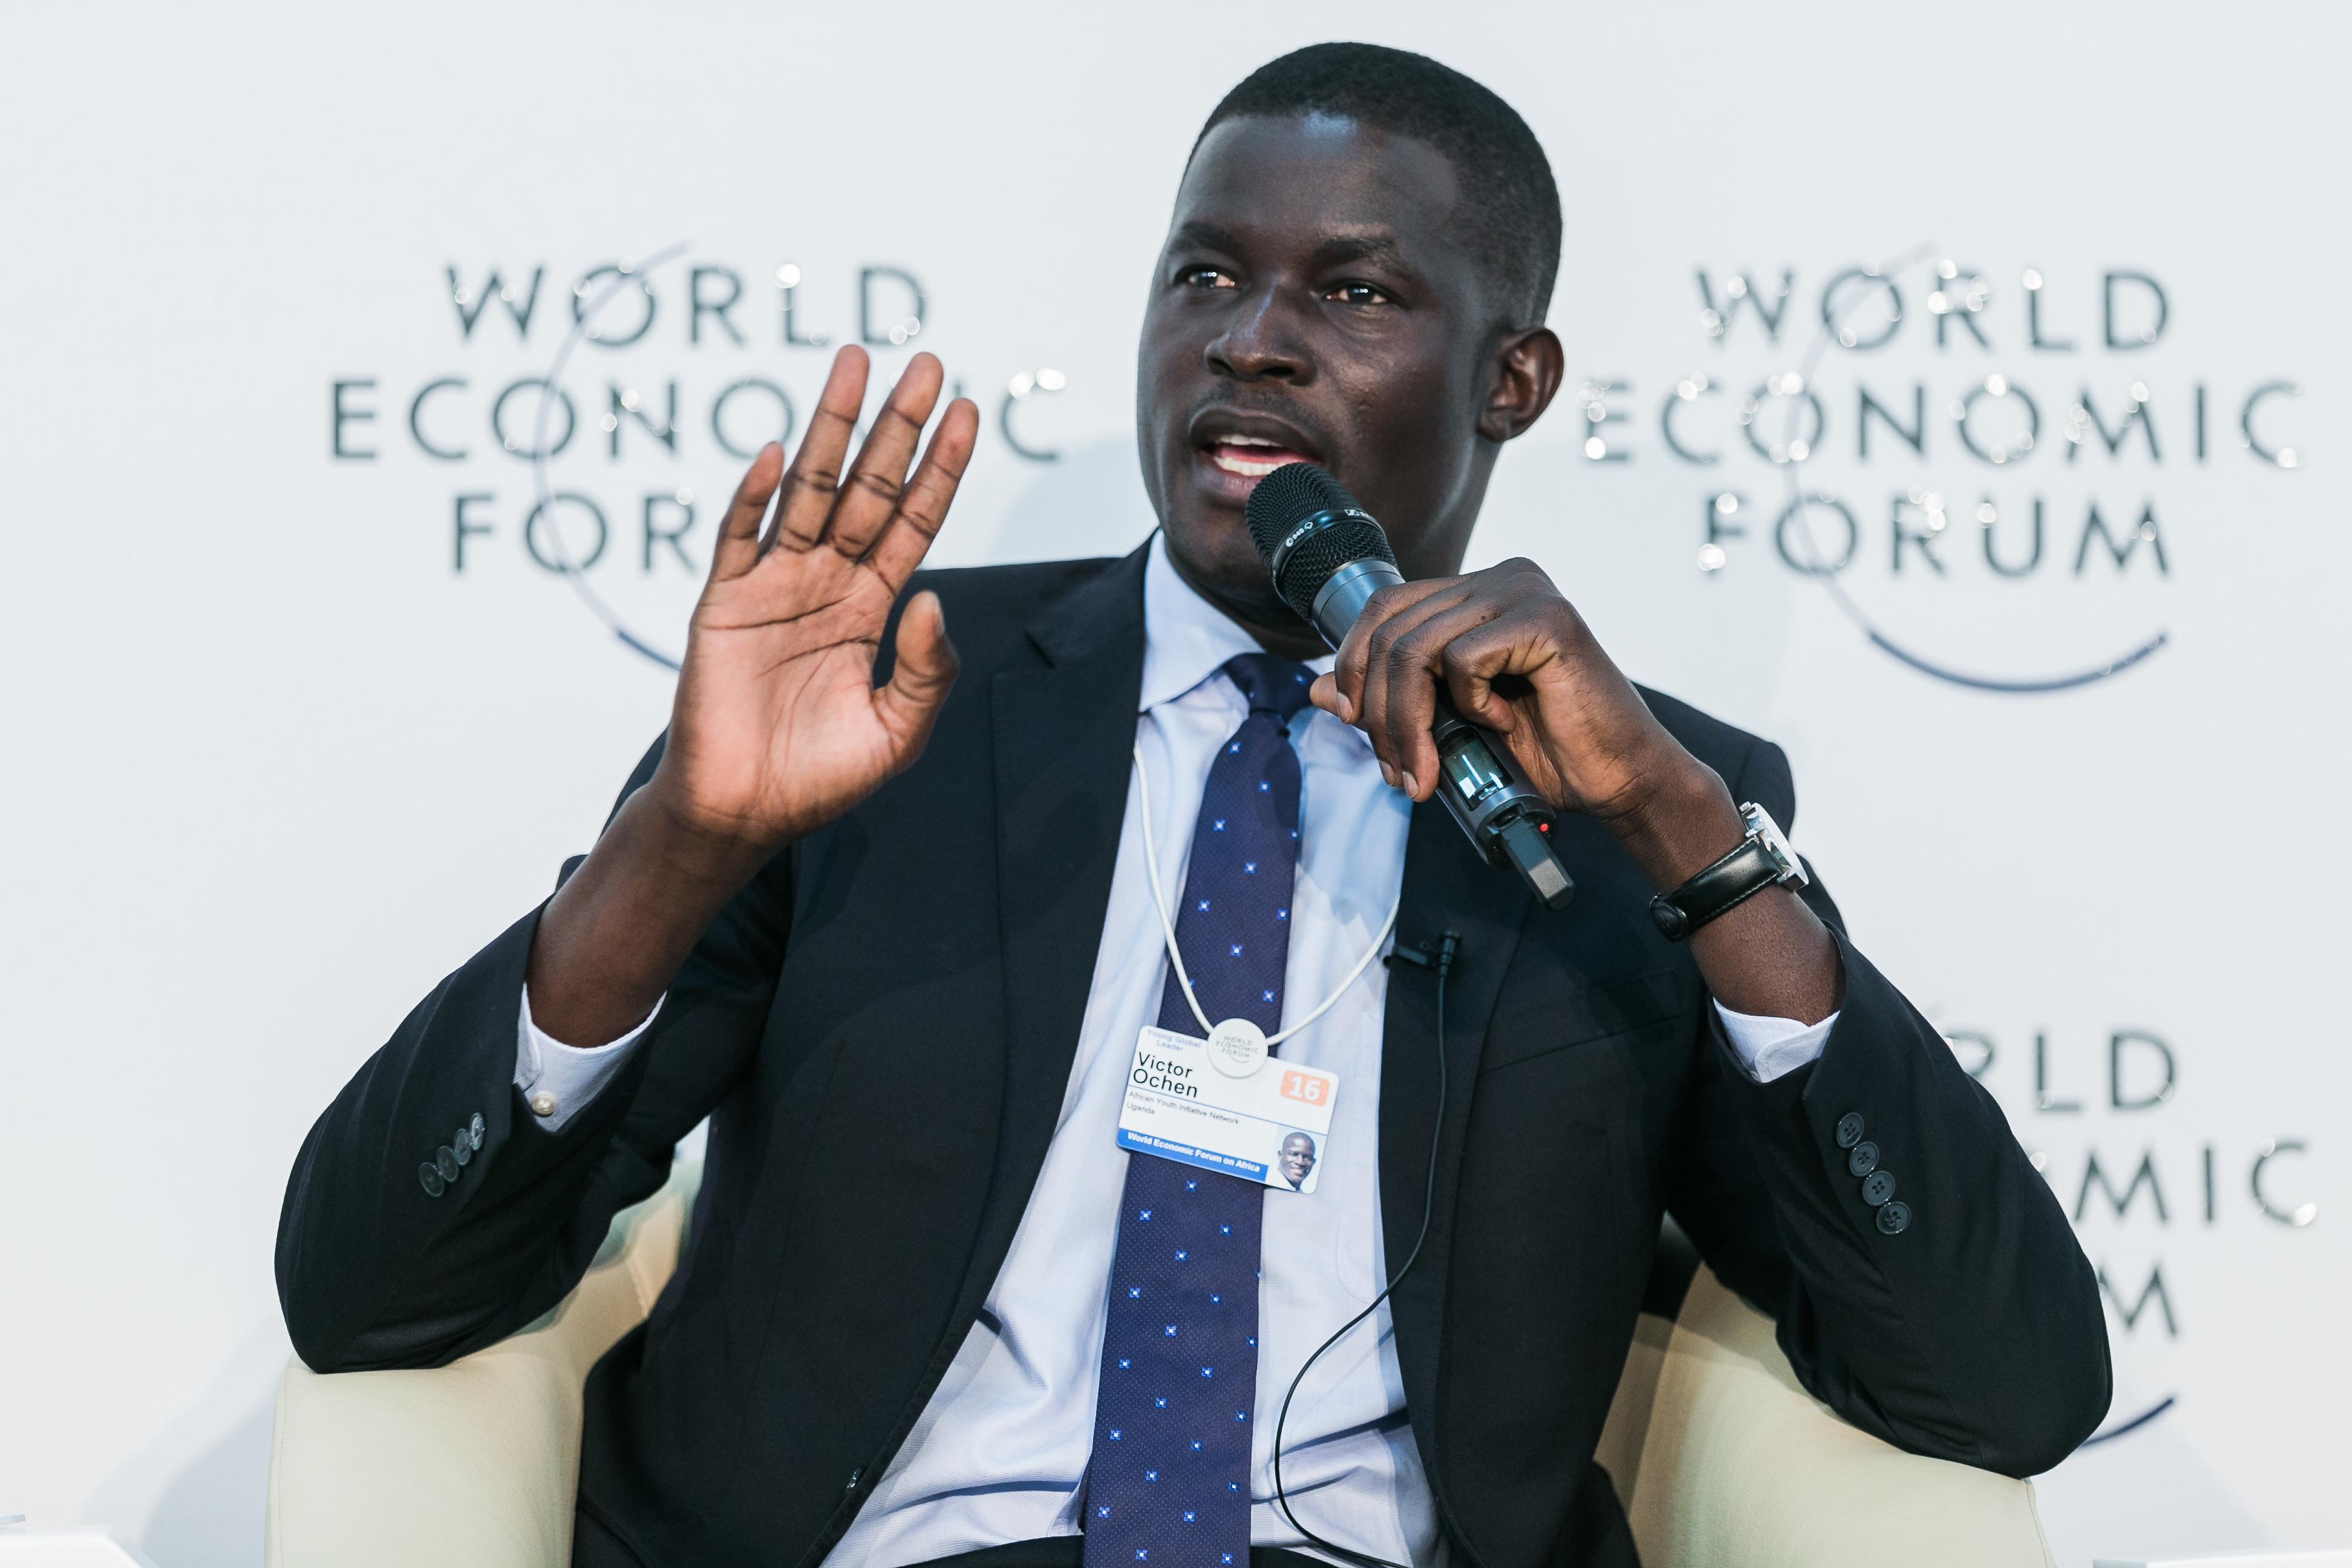 Victor Ochen, Executive Director, African Youth Initiative Network-Uganda, Uganda at the World Economic Forum on Africa 2016 in Kigali, Rwanda. Copyright by World Economic Forum / Benedikt von Loebell